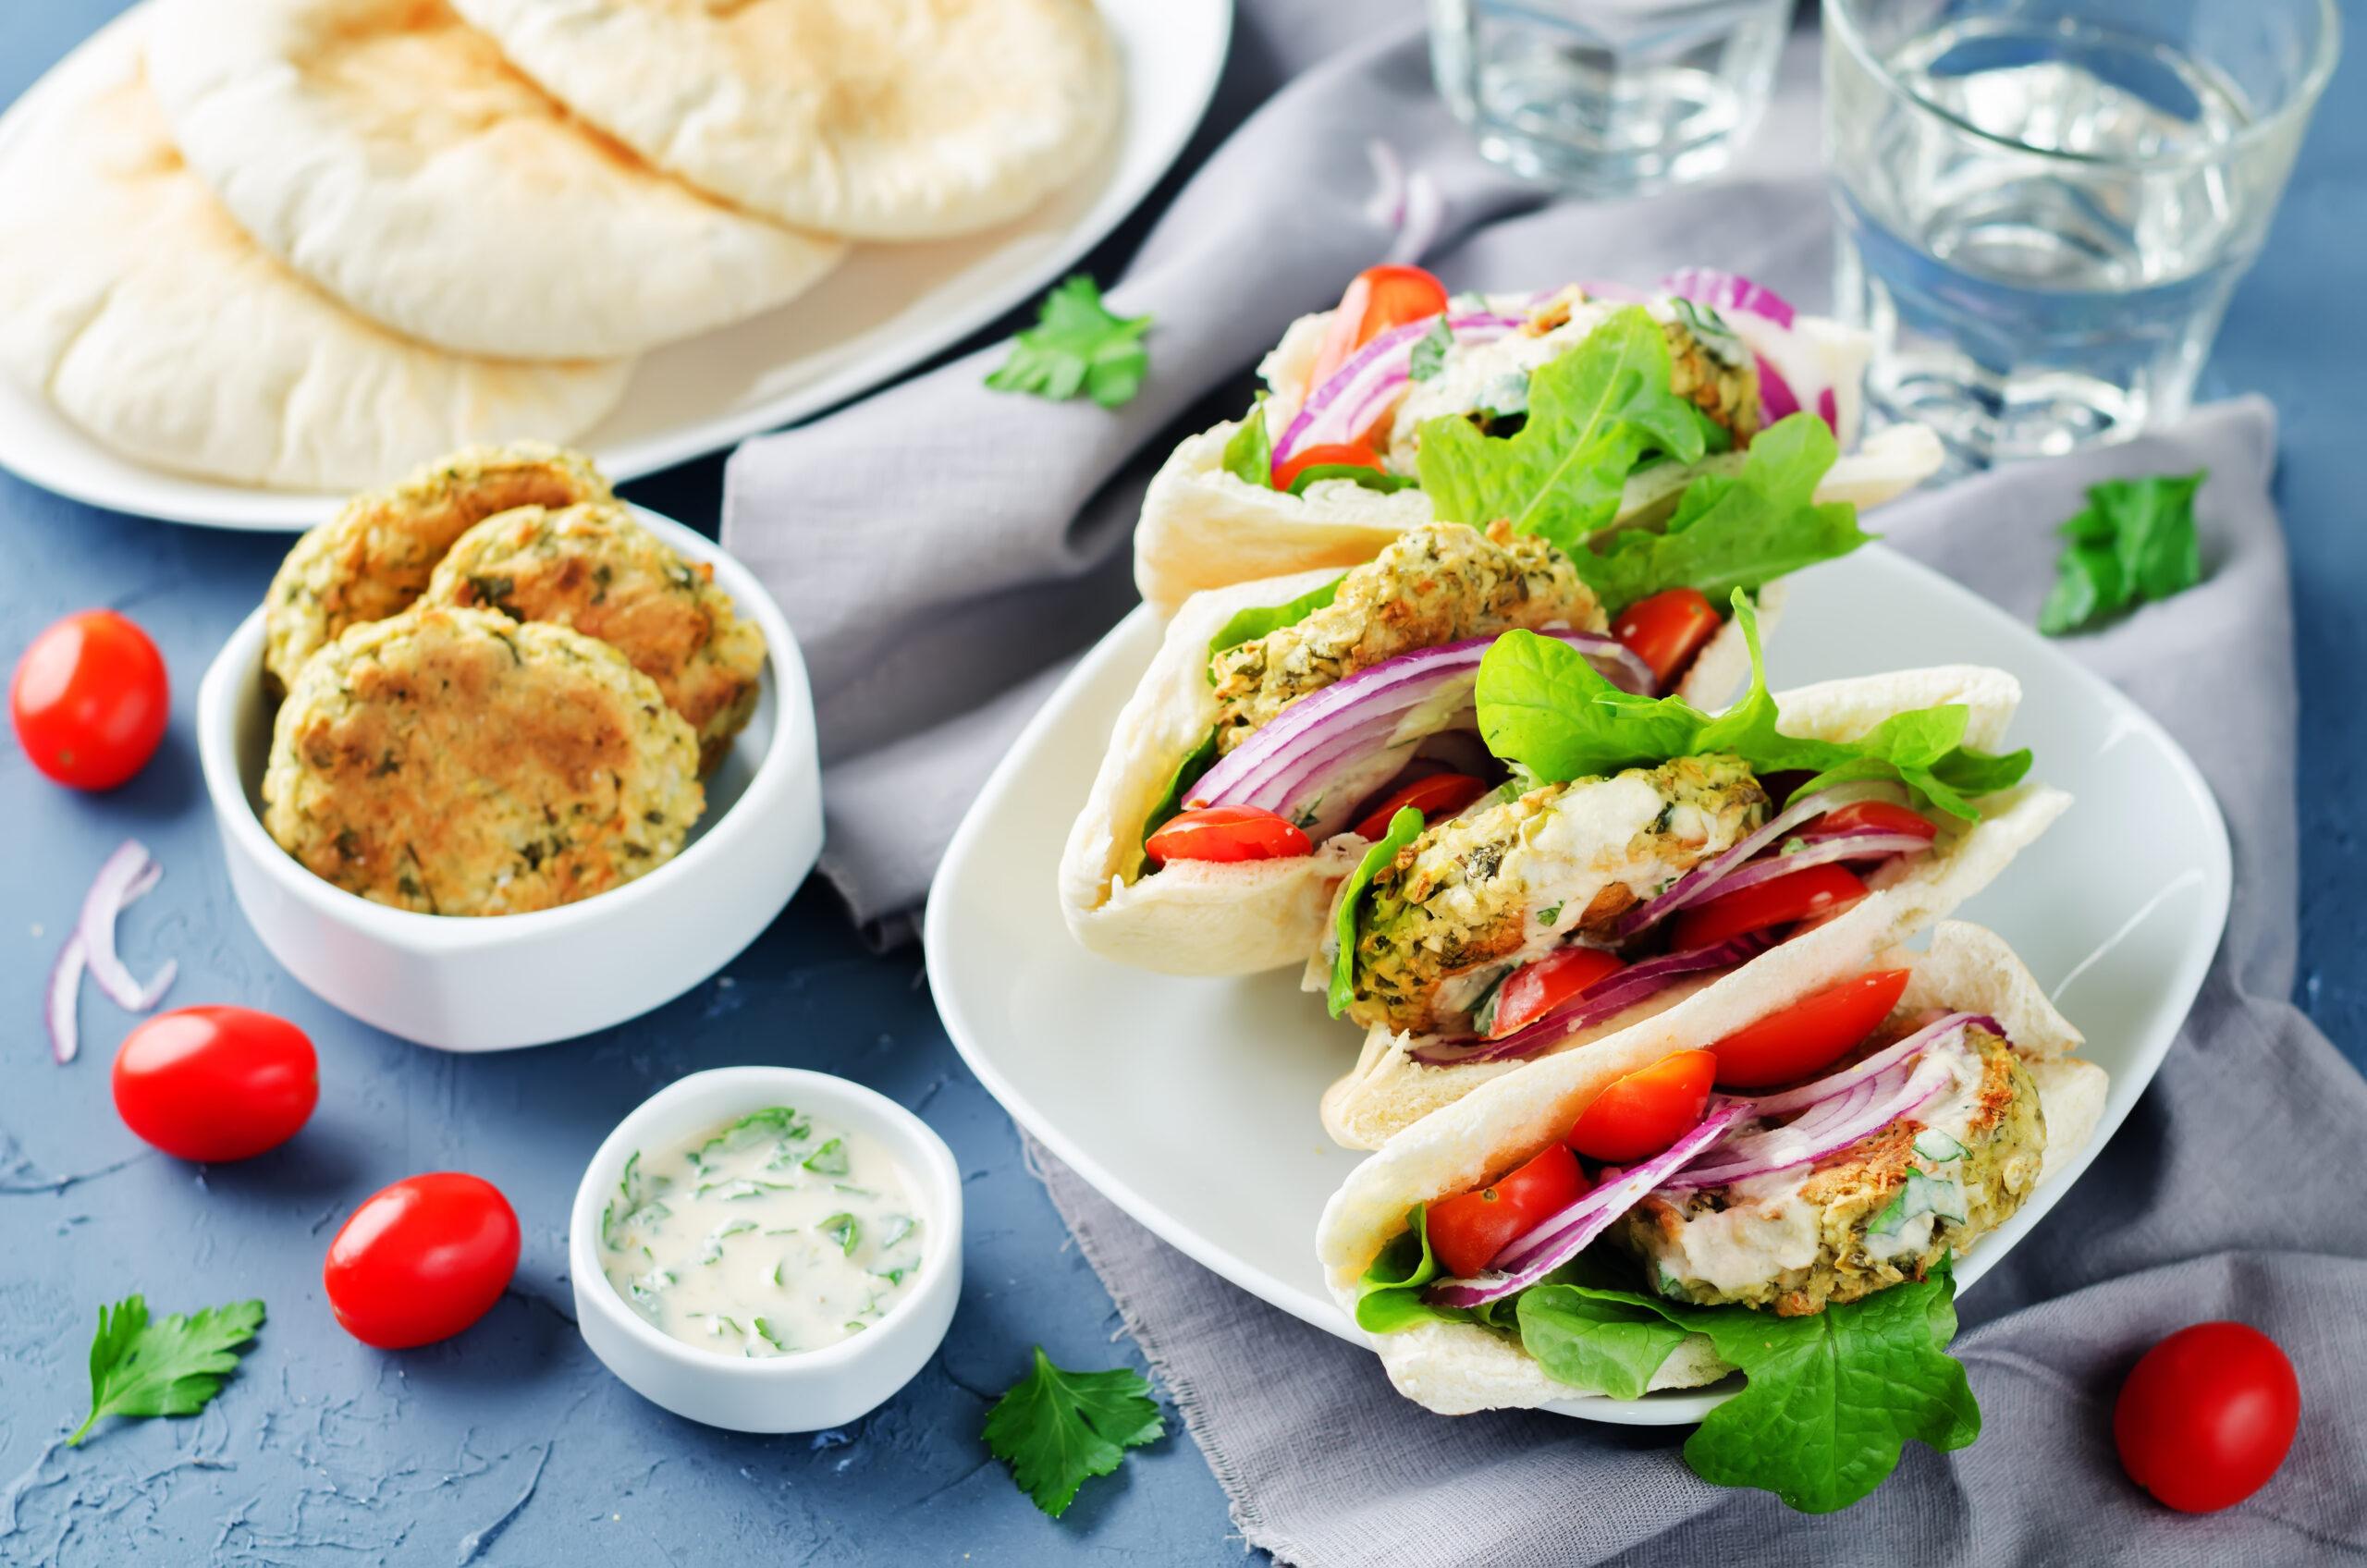 Baked Falafel vegetables lemon Tahini sauce Pita sandwich